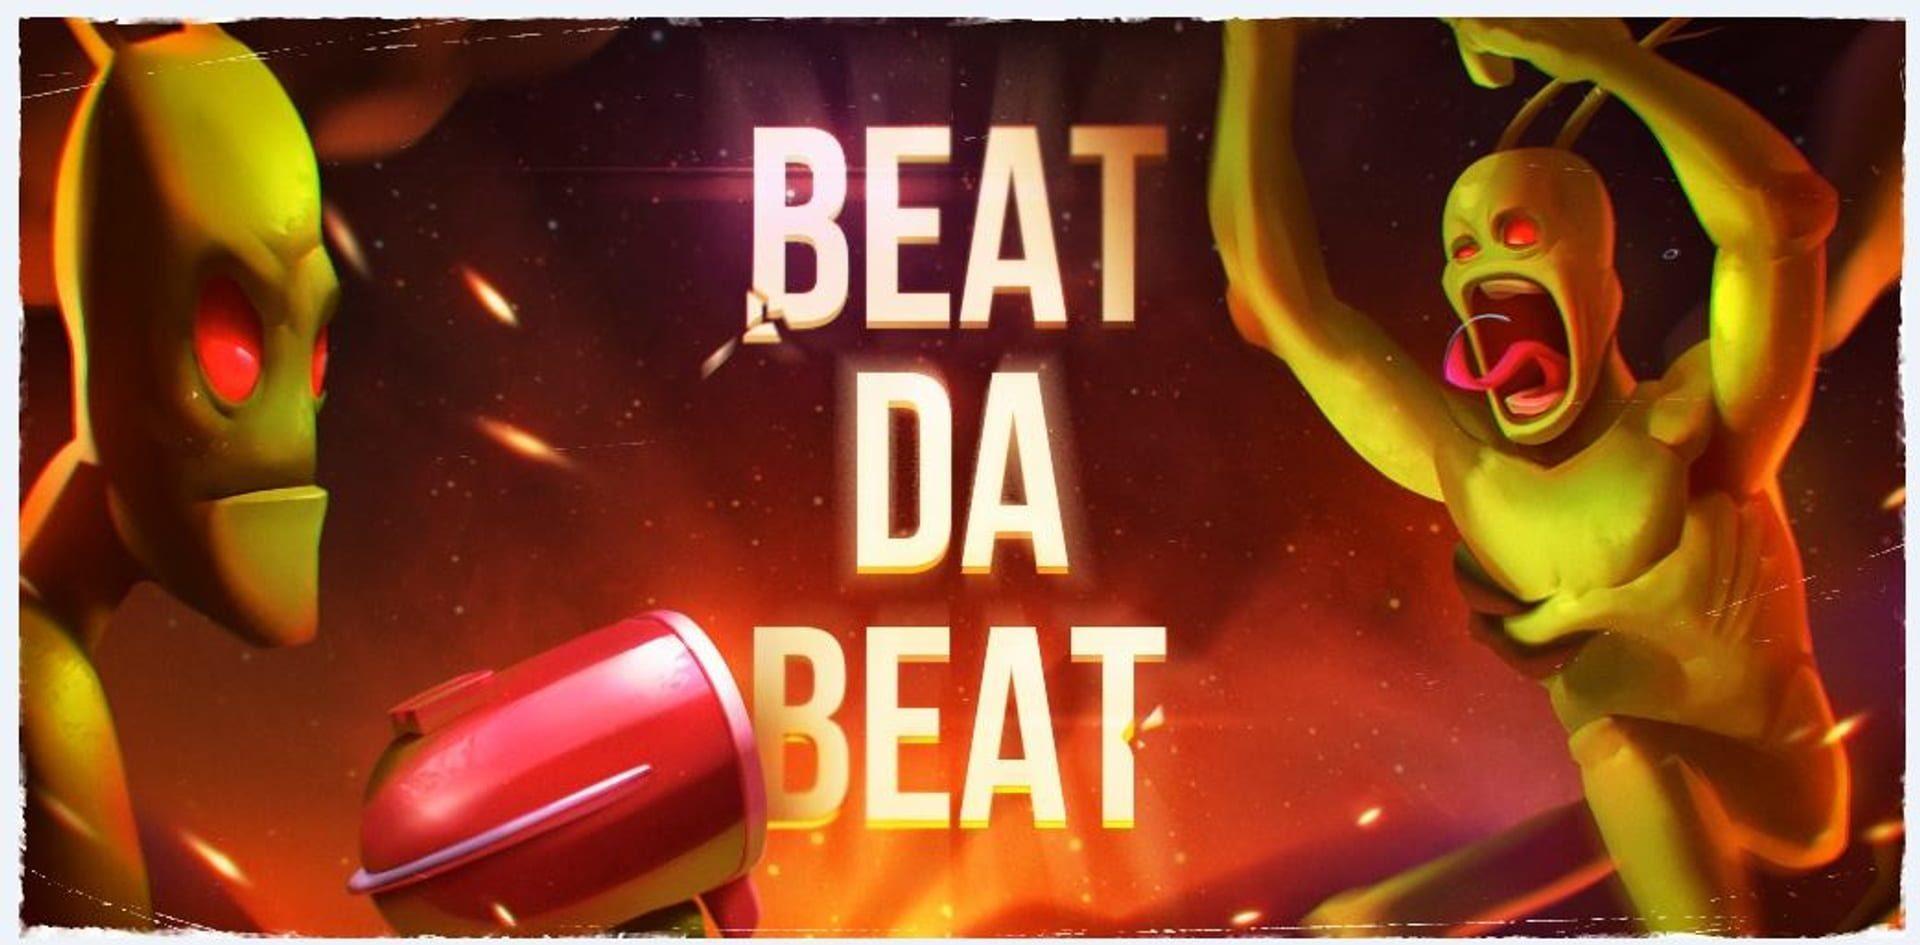 buy Beat Da Beat cd key for all platform